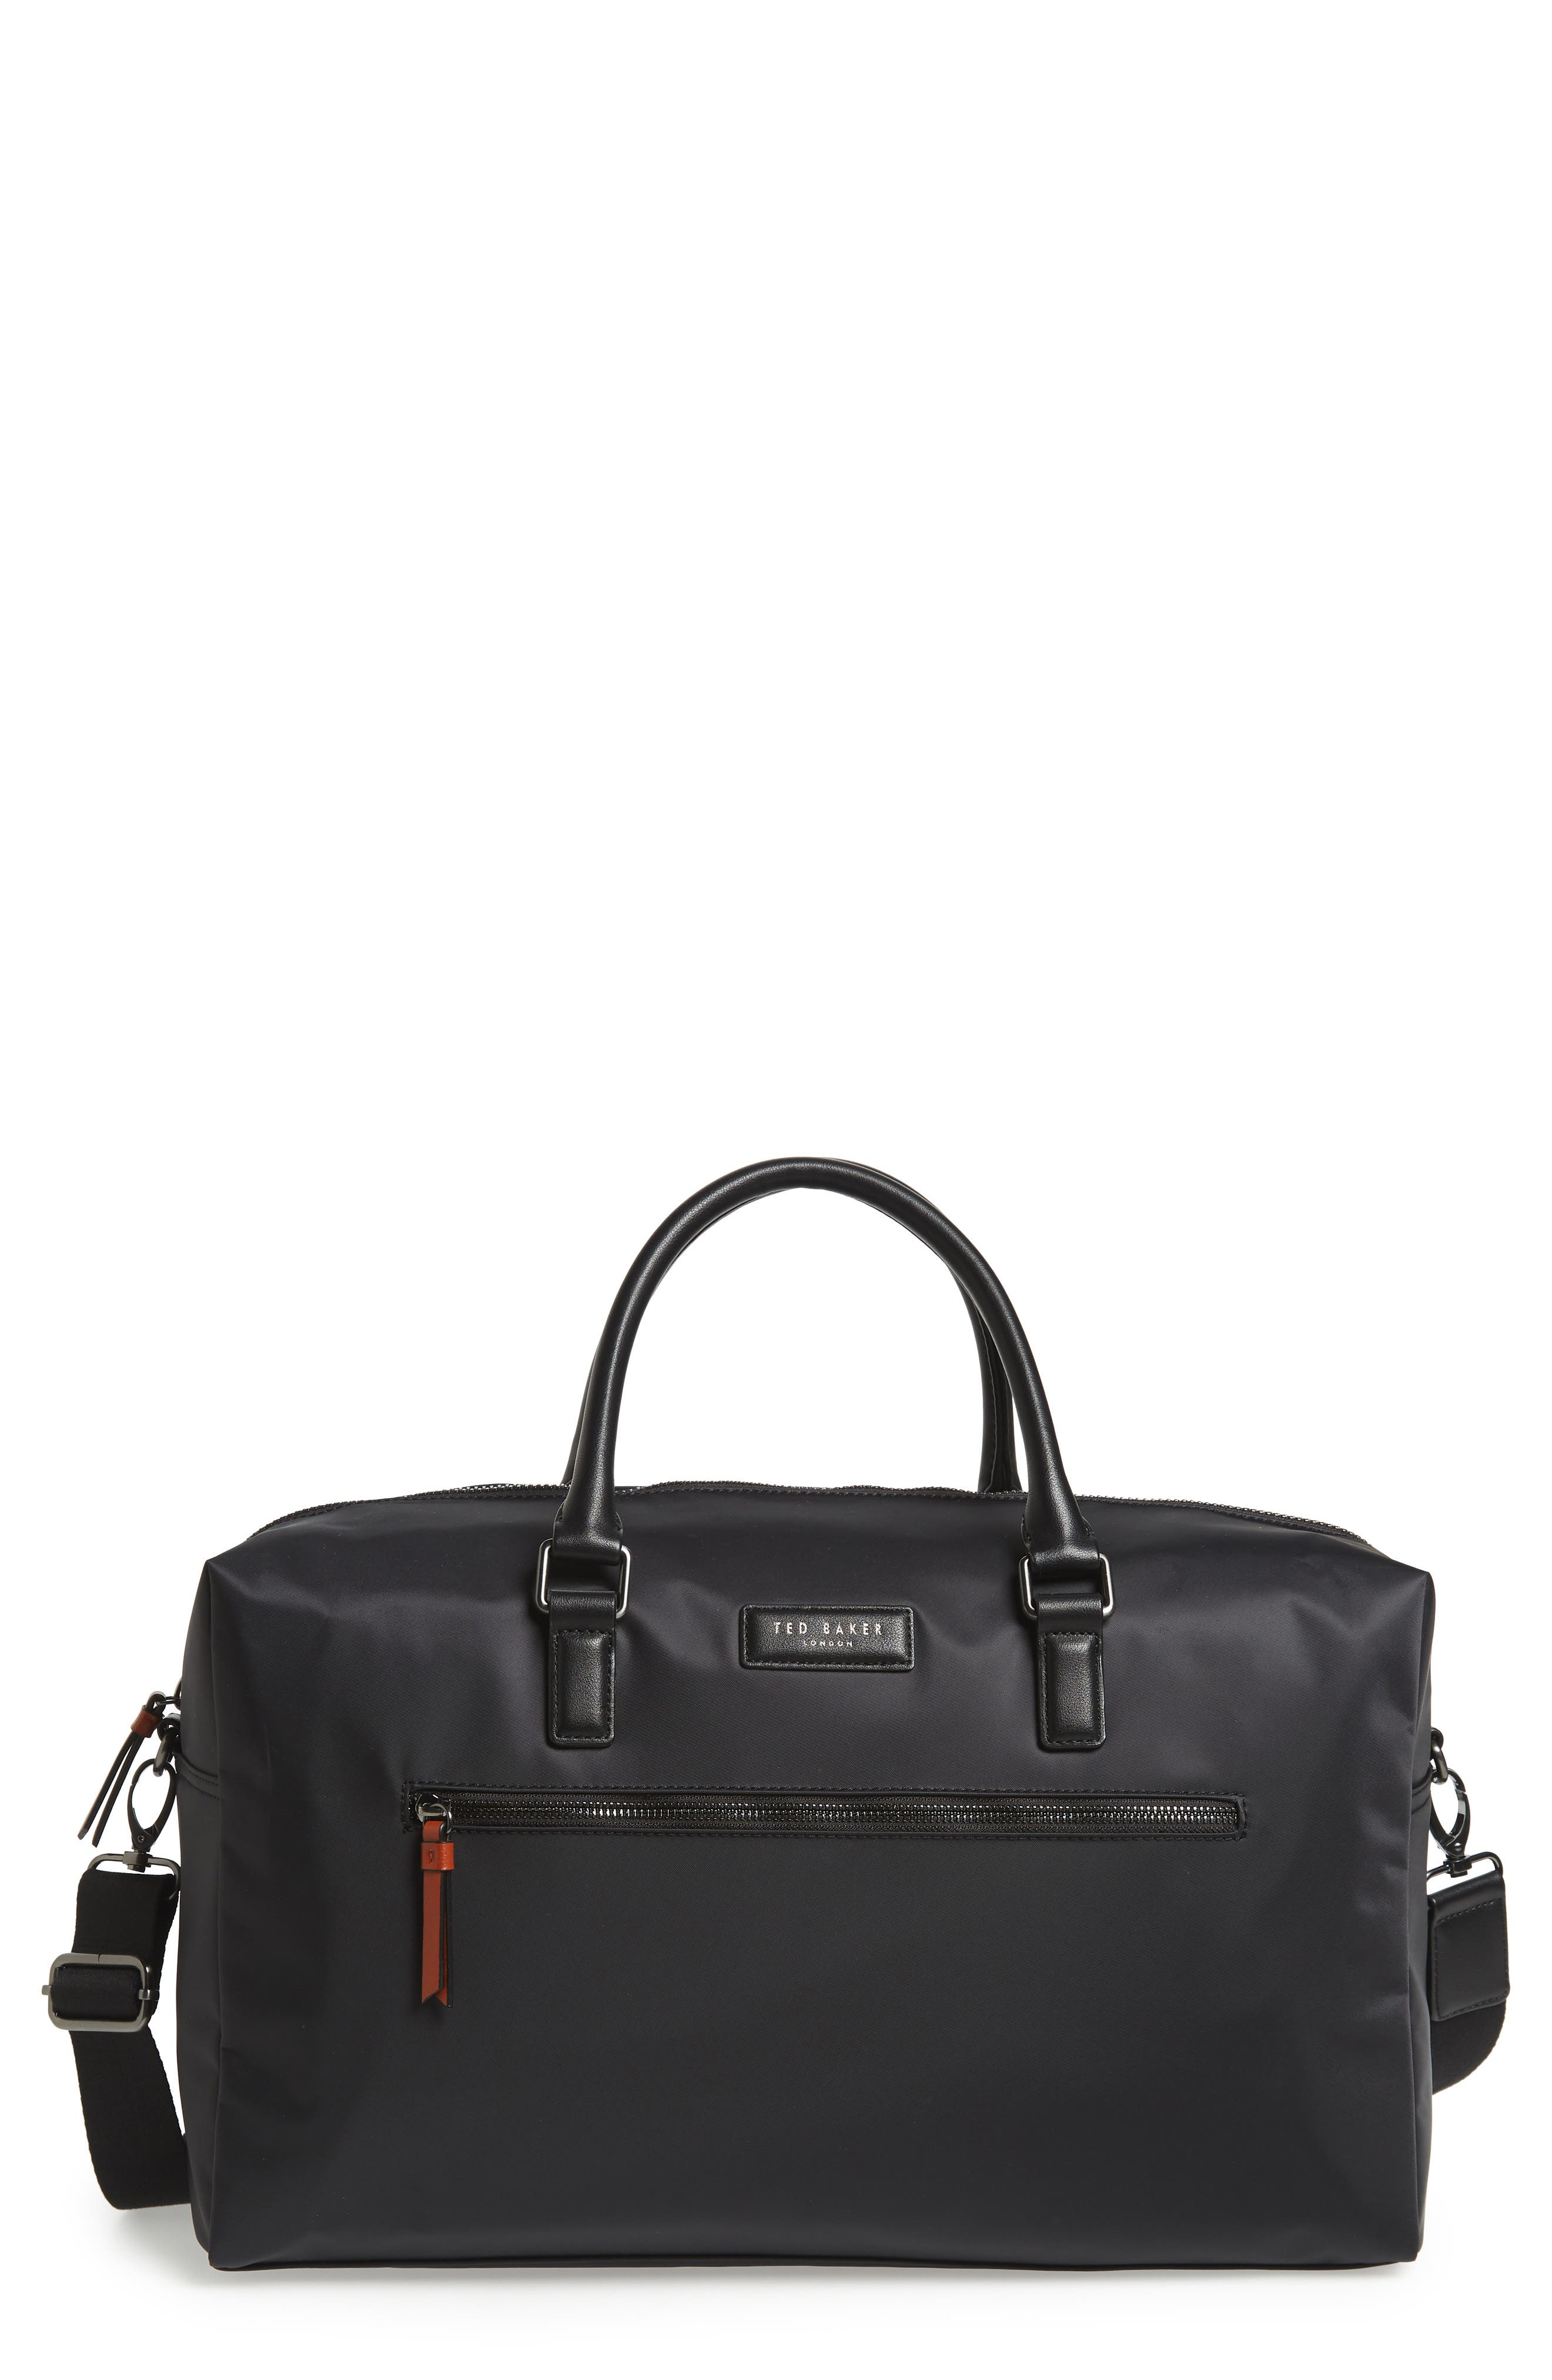 Nylon Duffel Bag,                             Main thumbnail 1, color,                             BLACK